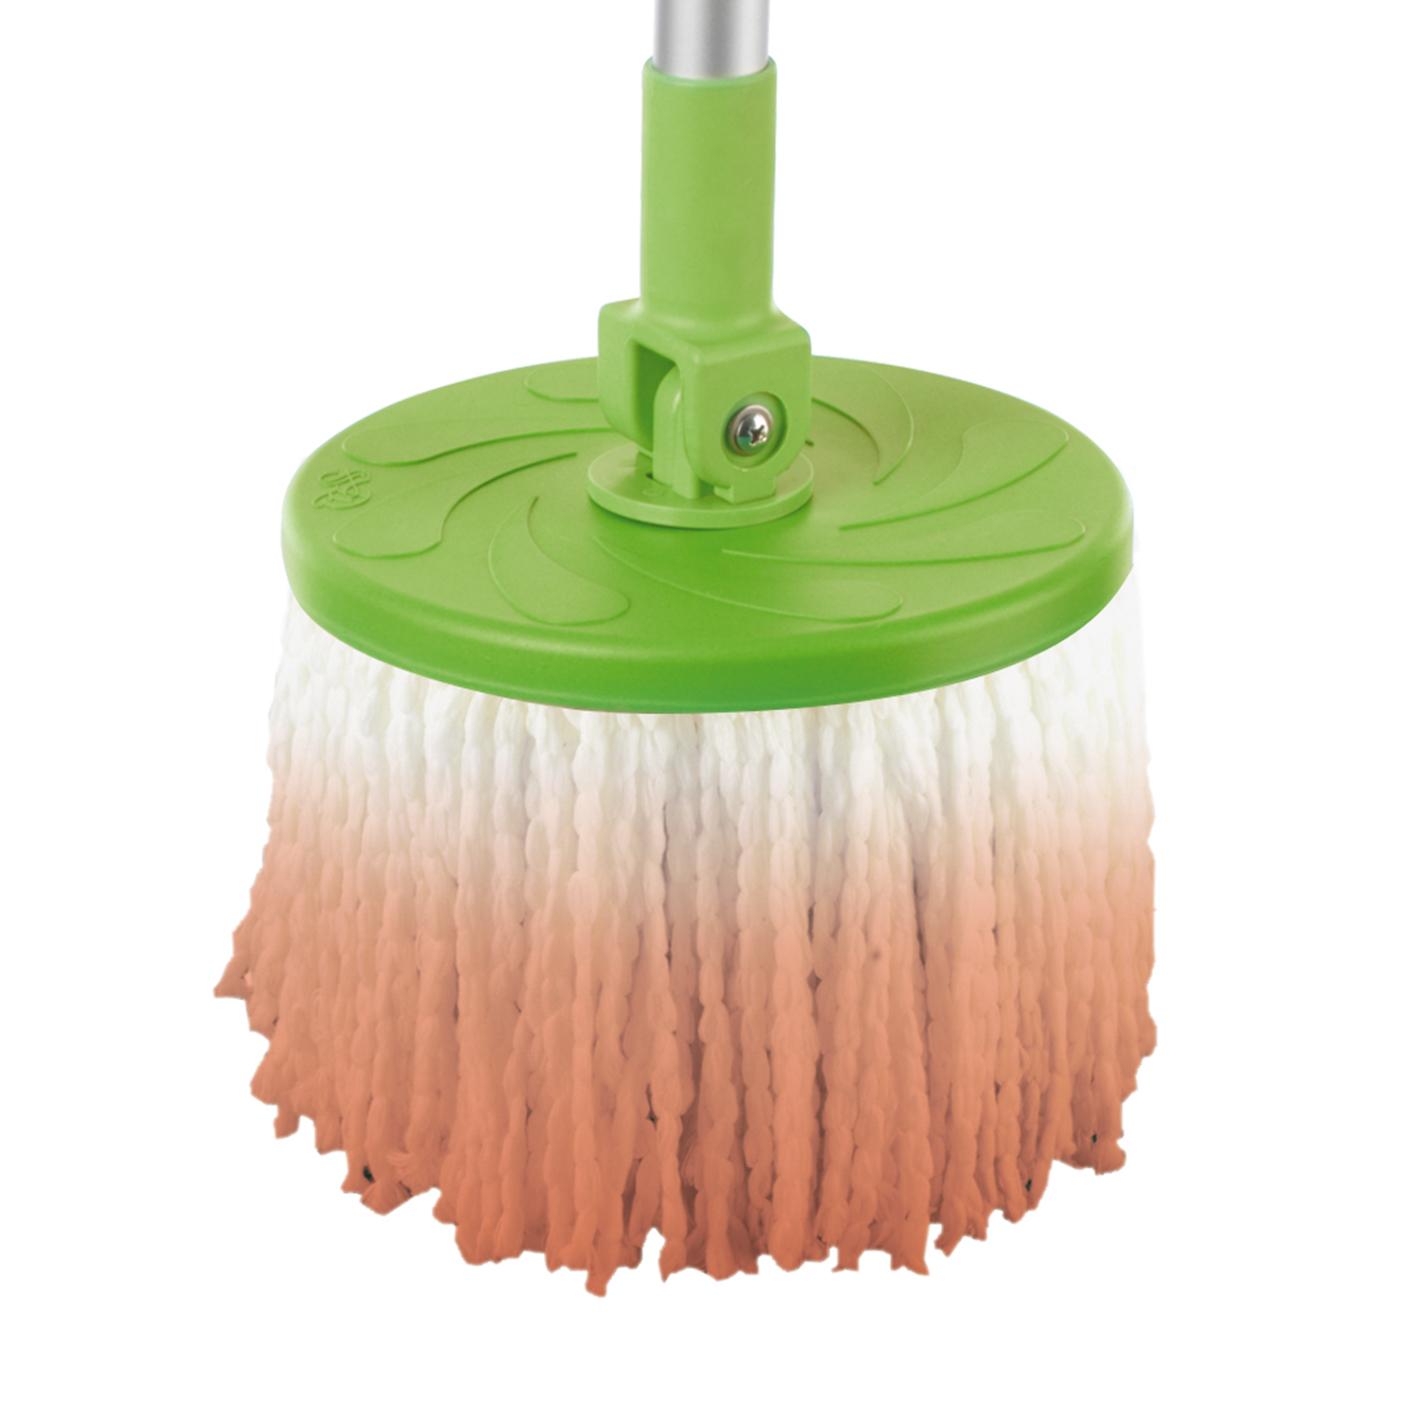 cleanmaxx ersatz moppaufsatz oval 2er set f r power wischmopp ersatzm ppe mop ebay. Black Bedroom Furniture Sets. Home Design Ideas